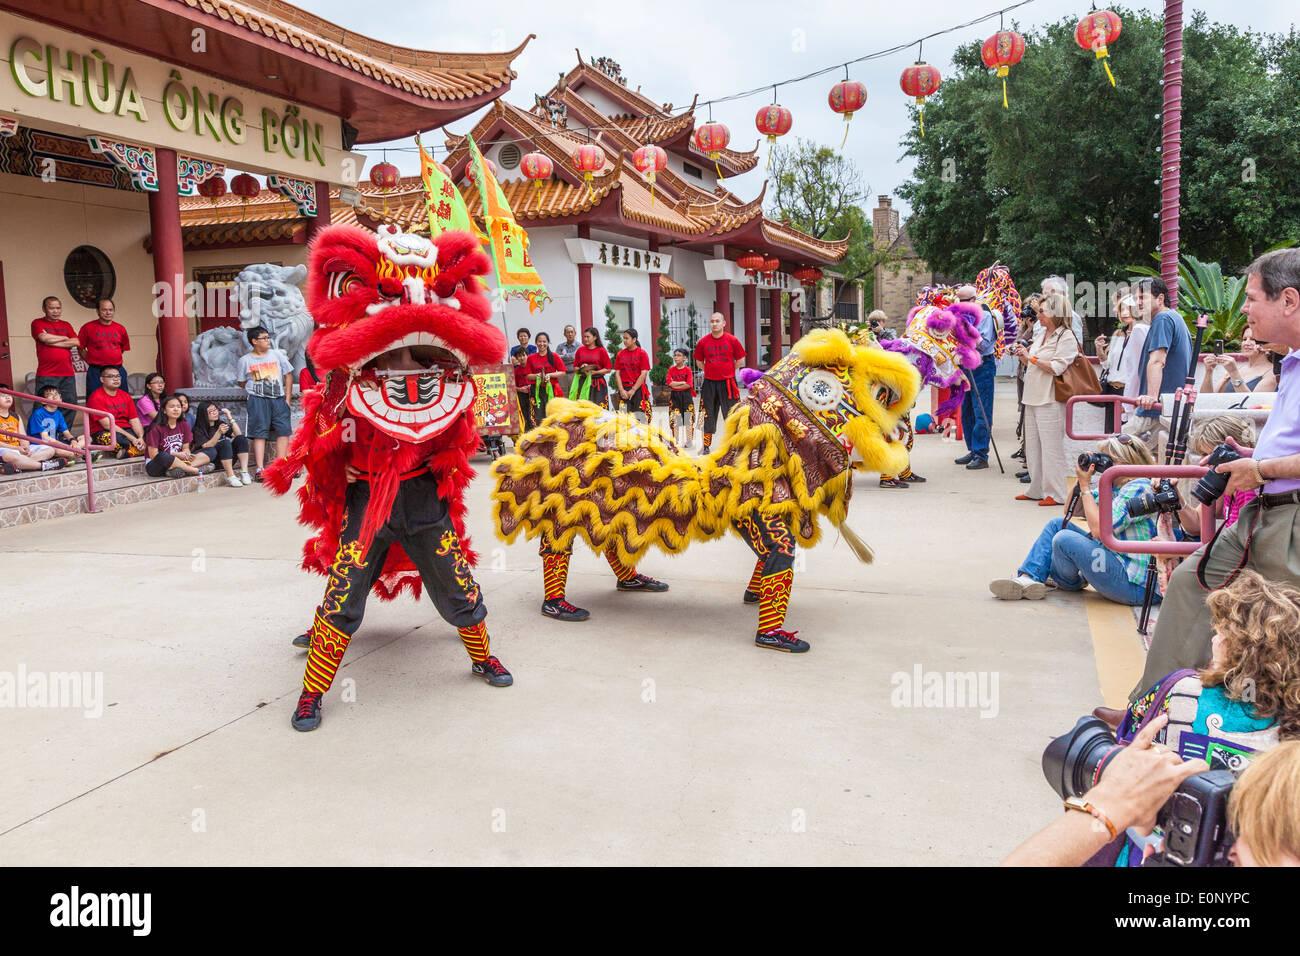 Uncategorized Lion Dancer lion dance performance at teo chew temple in houston stock photo houston